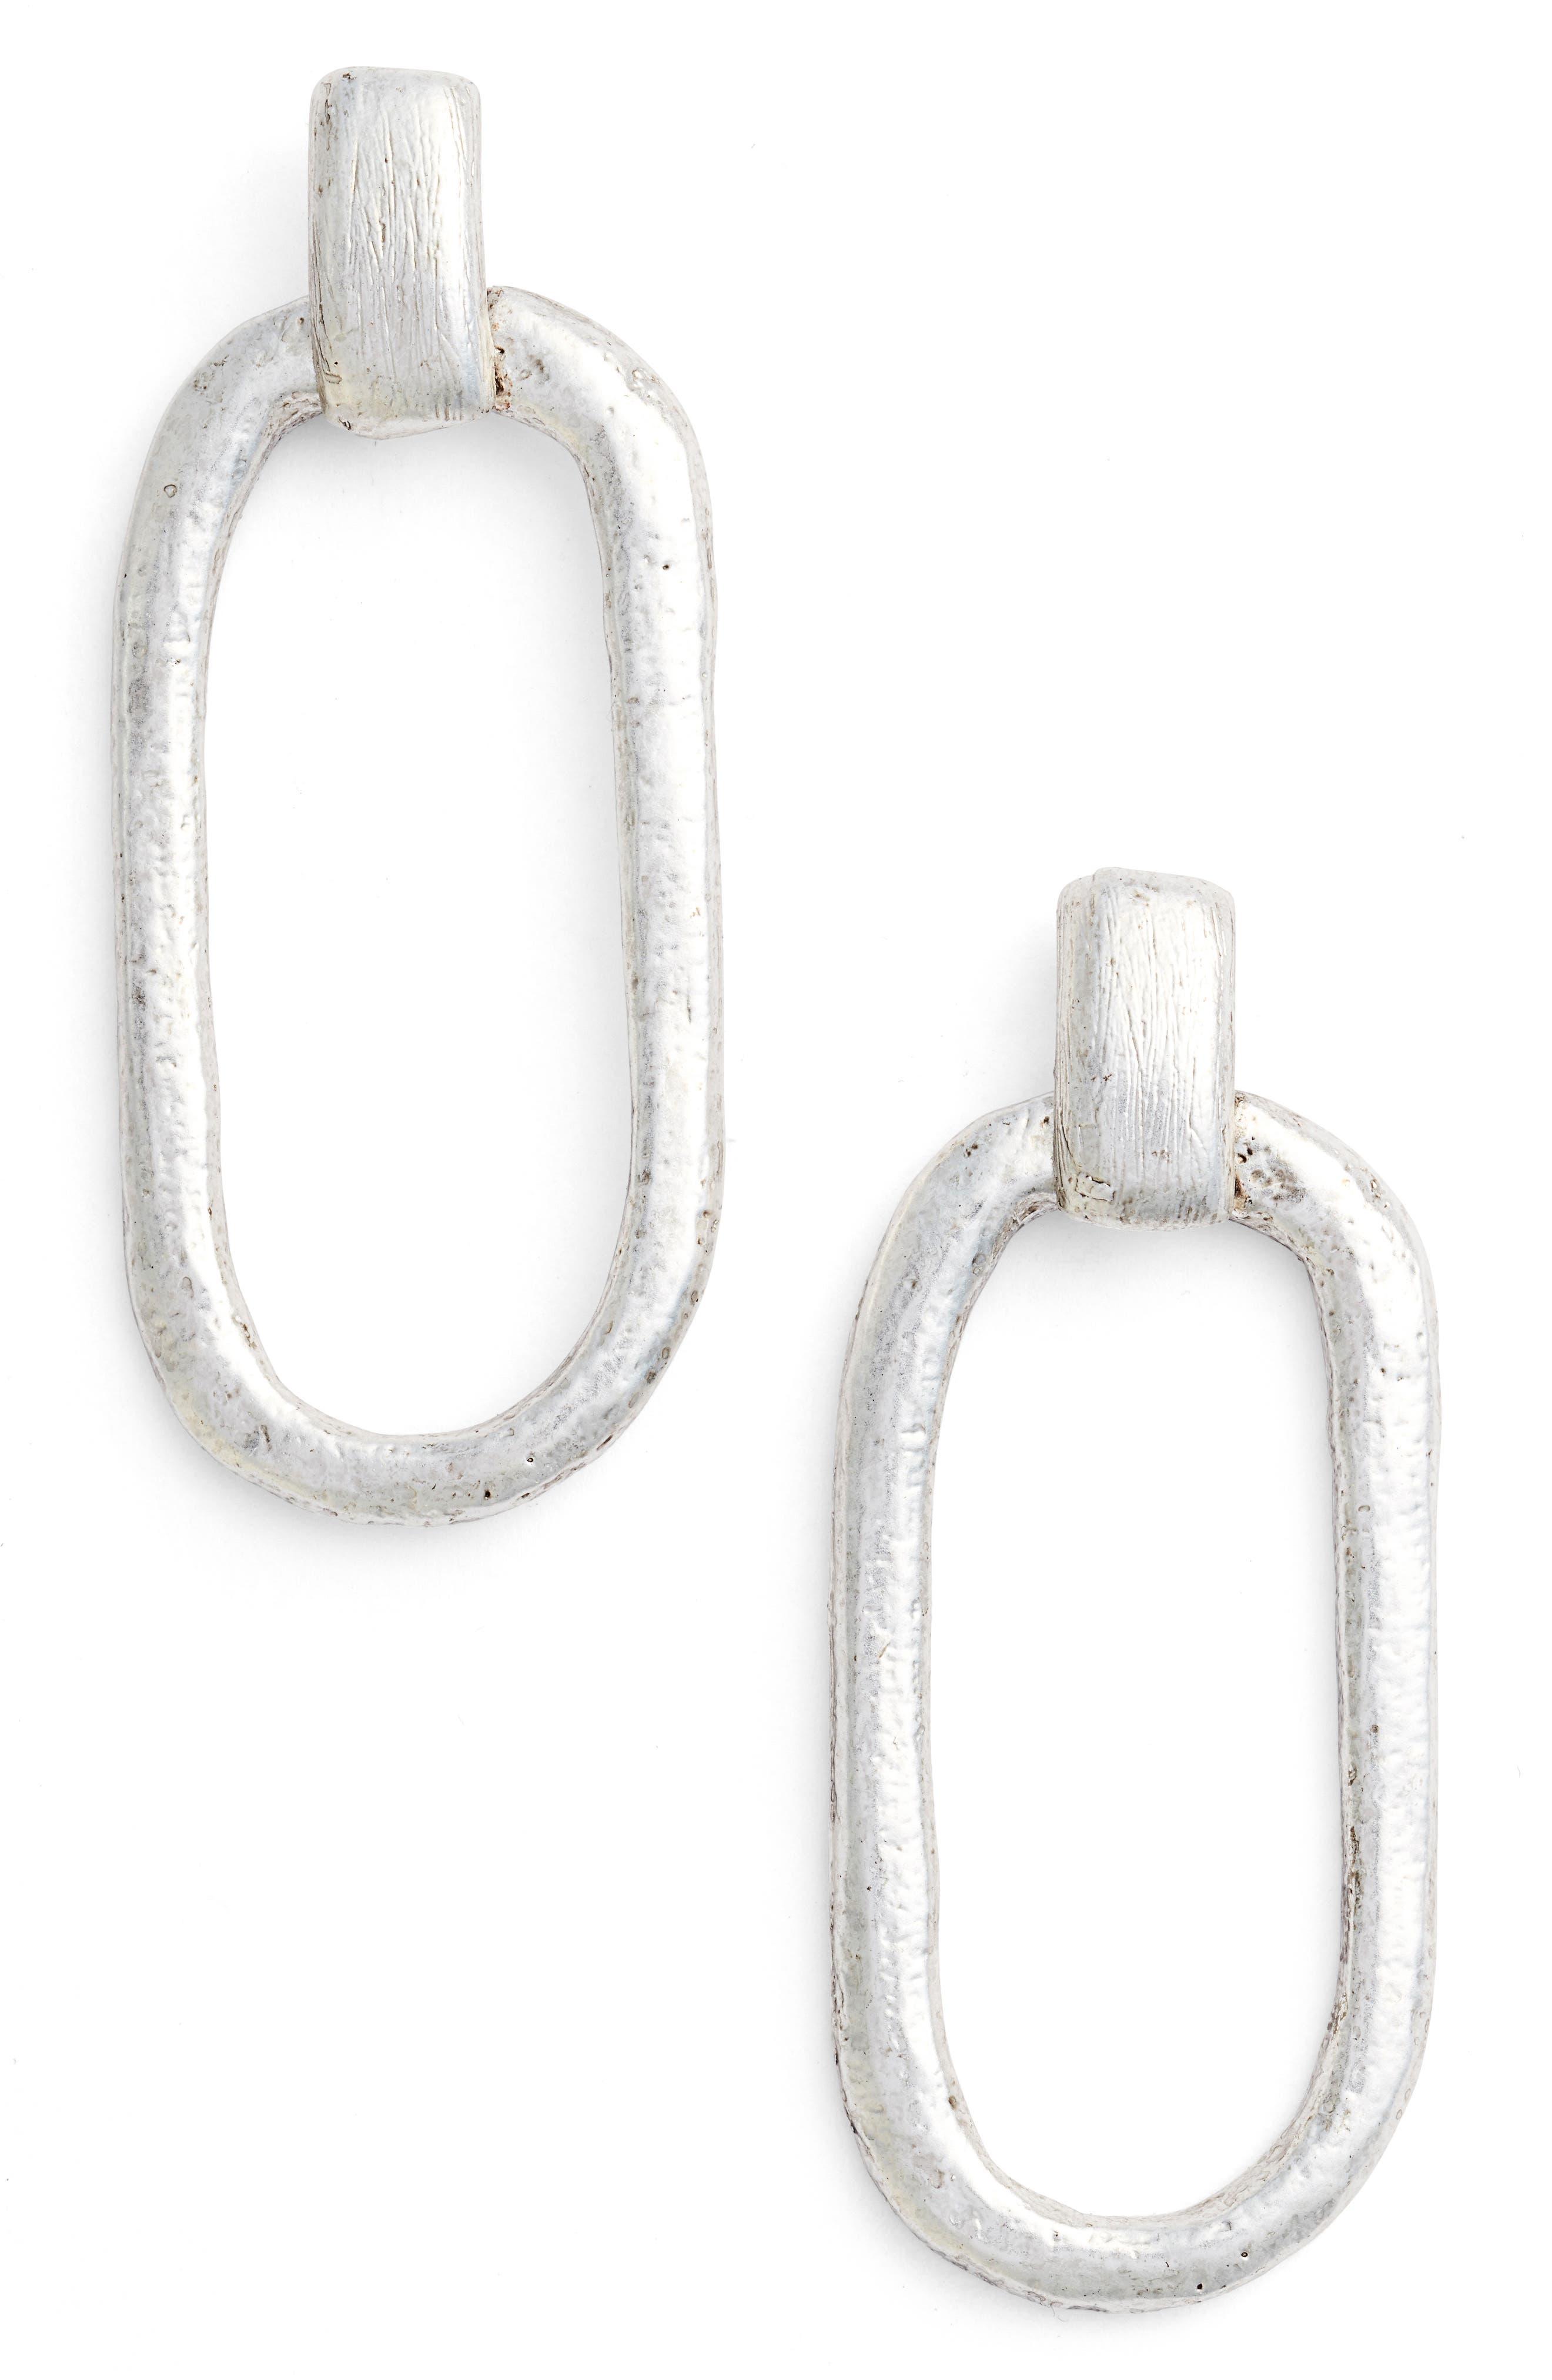 Doorknocker Earrings,                             Main thumbnail 1, color,                             SILVER